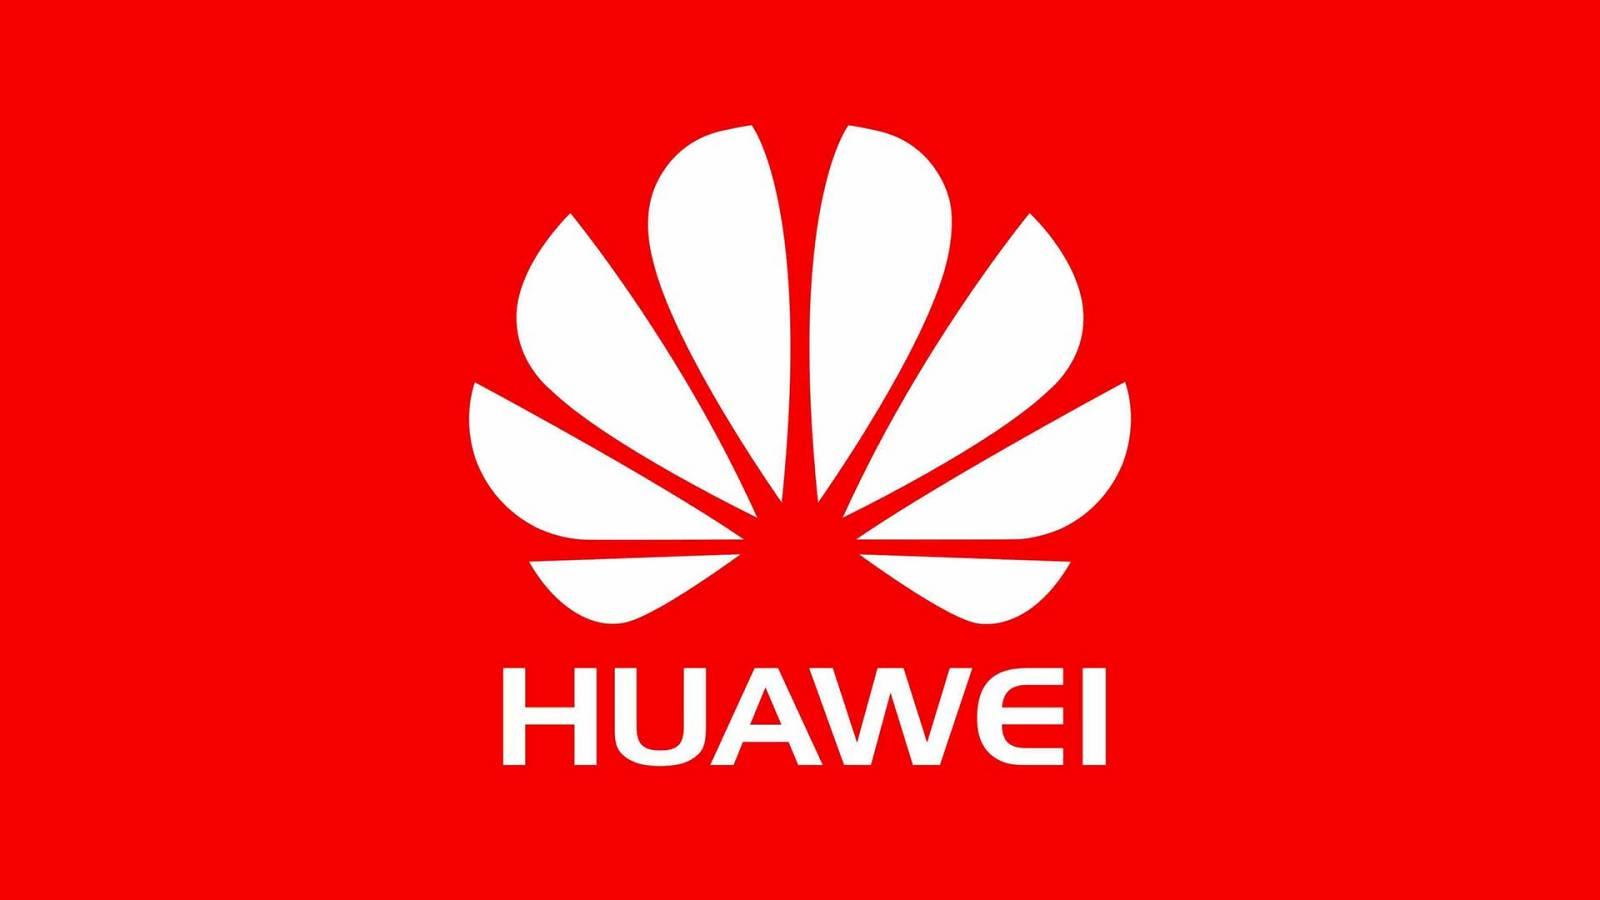 Huawei Lanseaza Noi Echipamente pentru Retelele 5G